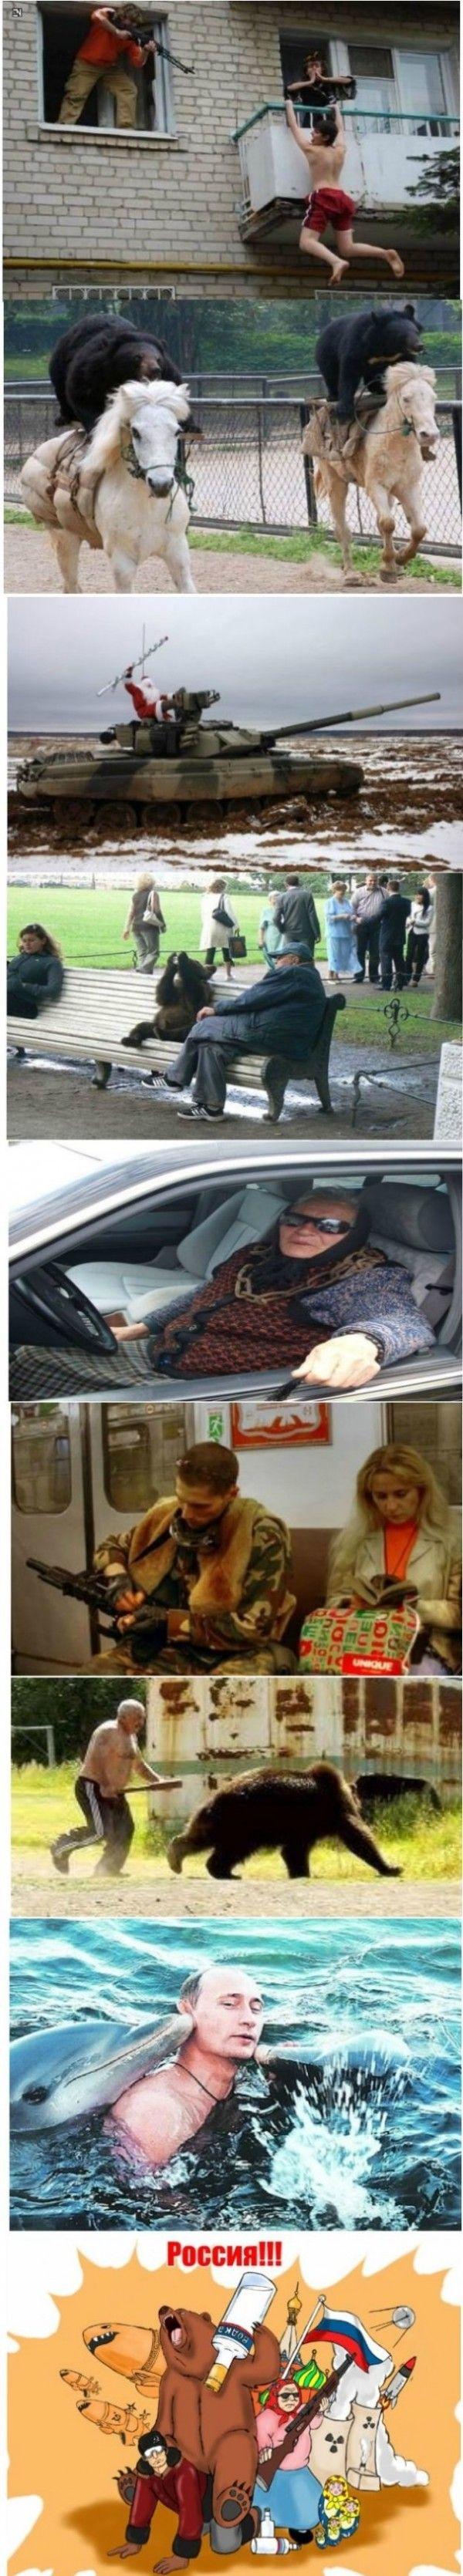 Russia.... Lol moments